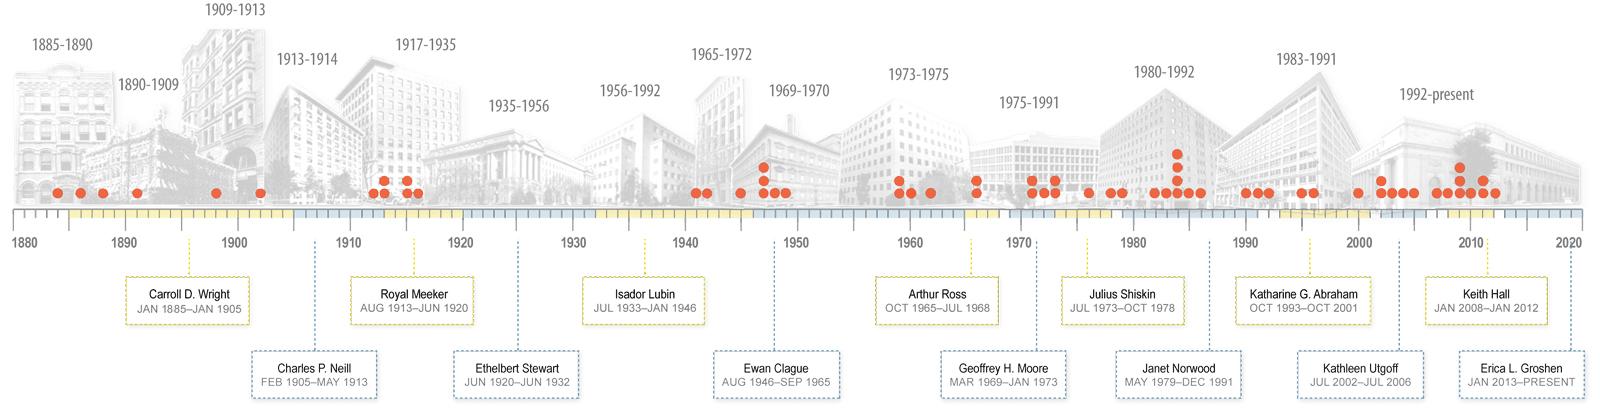 K-12  History of BLS  US Bureau of Labor Statistics